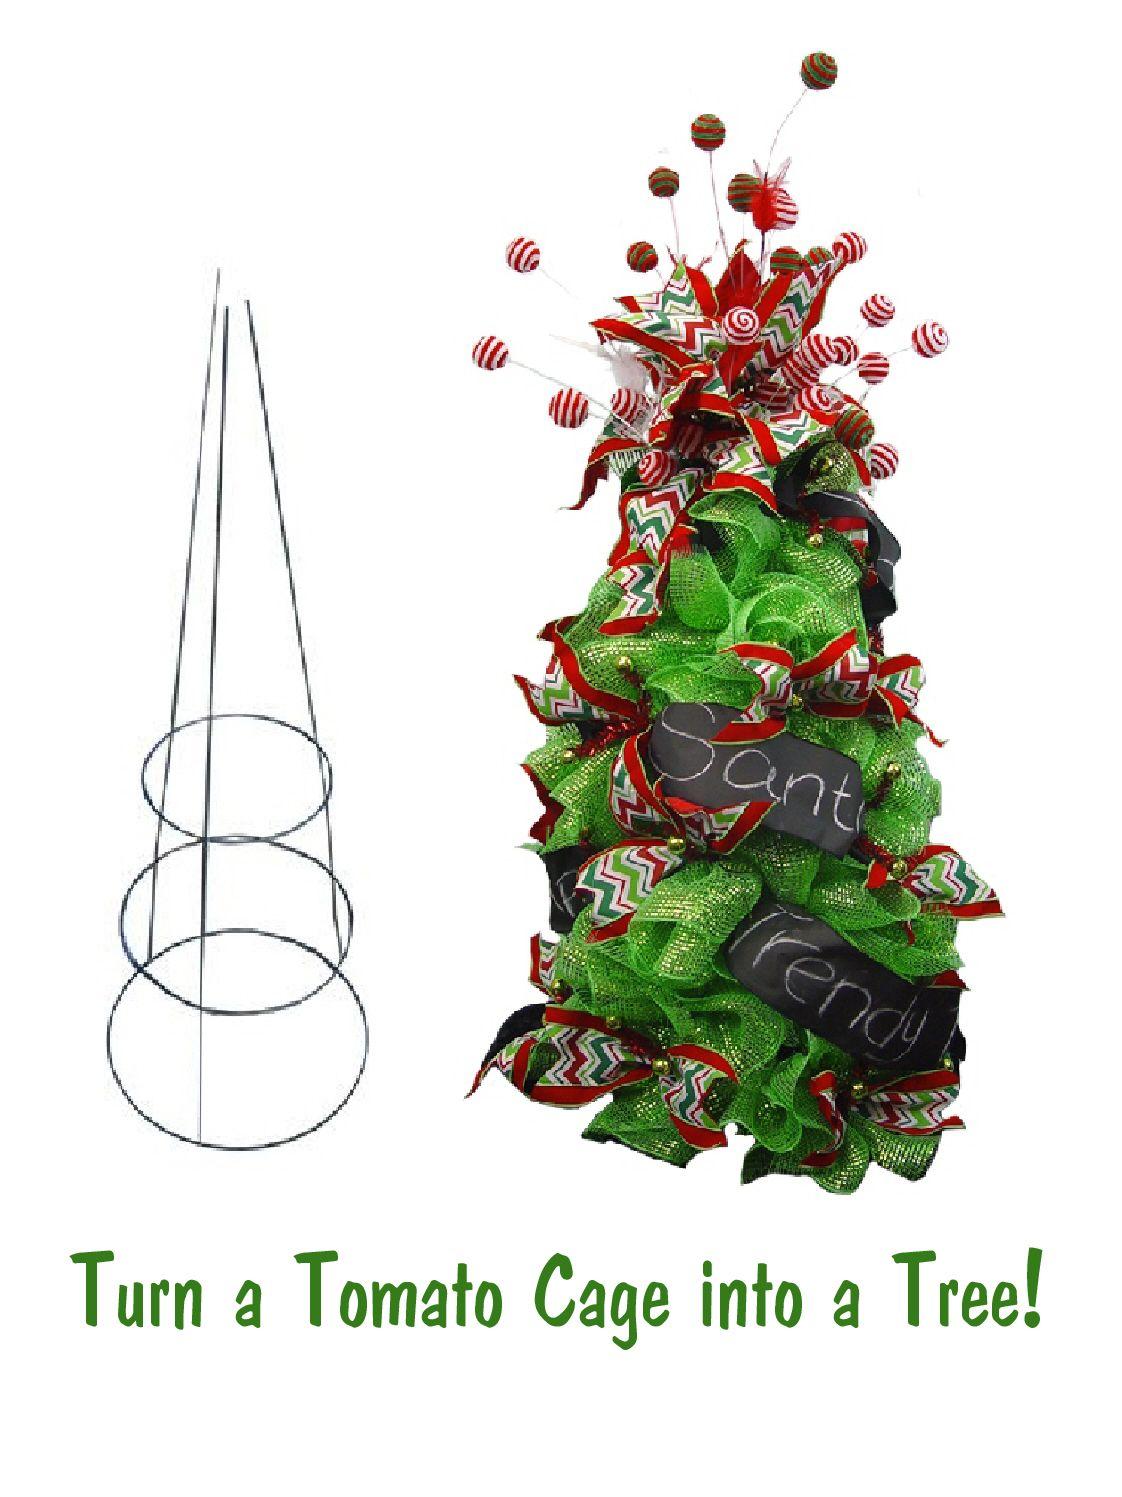 Tomato Cage:Christmas Decor 2021 Pinterest 170 Christmas Tree Tomato Cage Ideas Christmas Christmas Tree Tomato Cage Christmas Tree